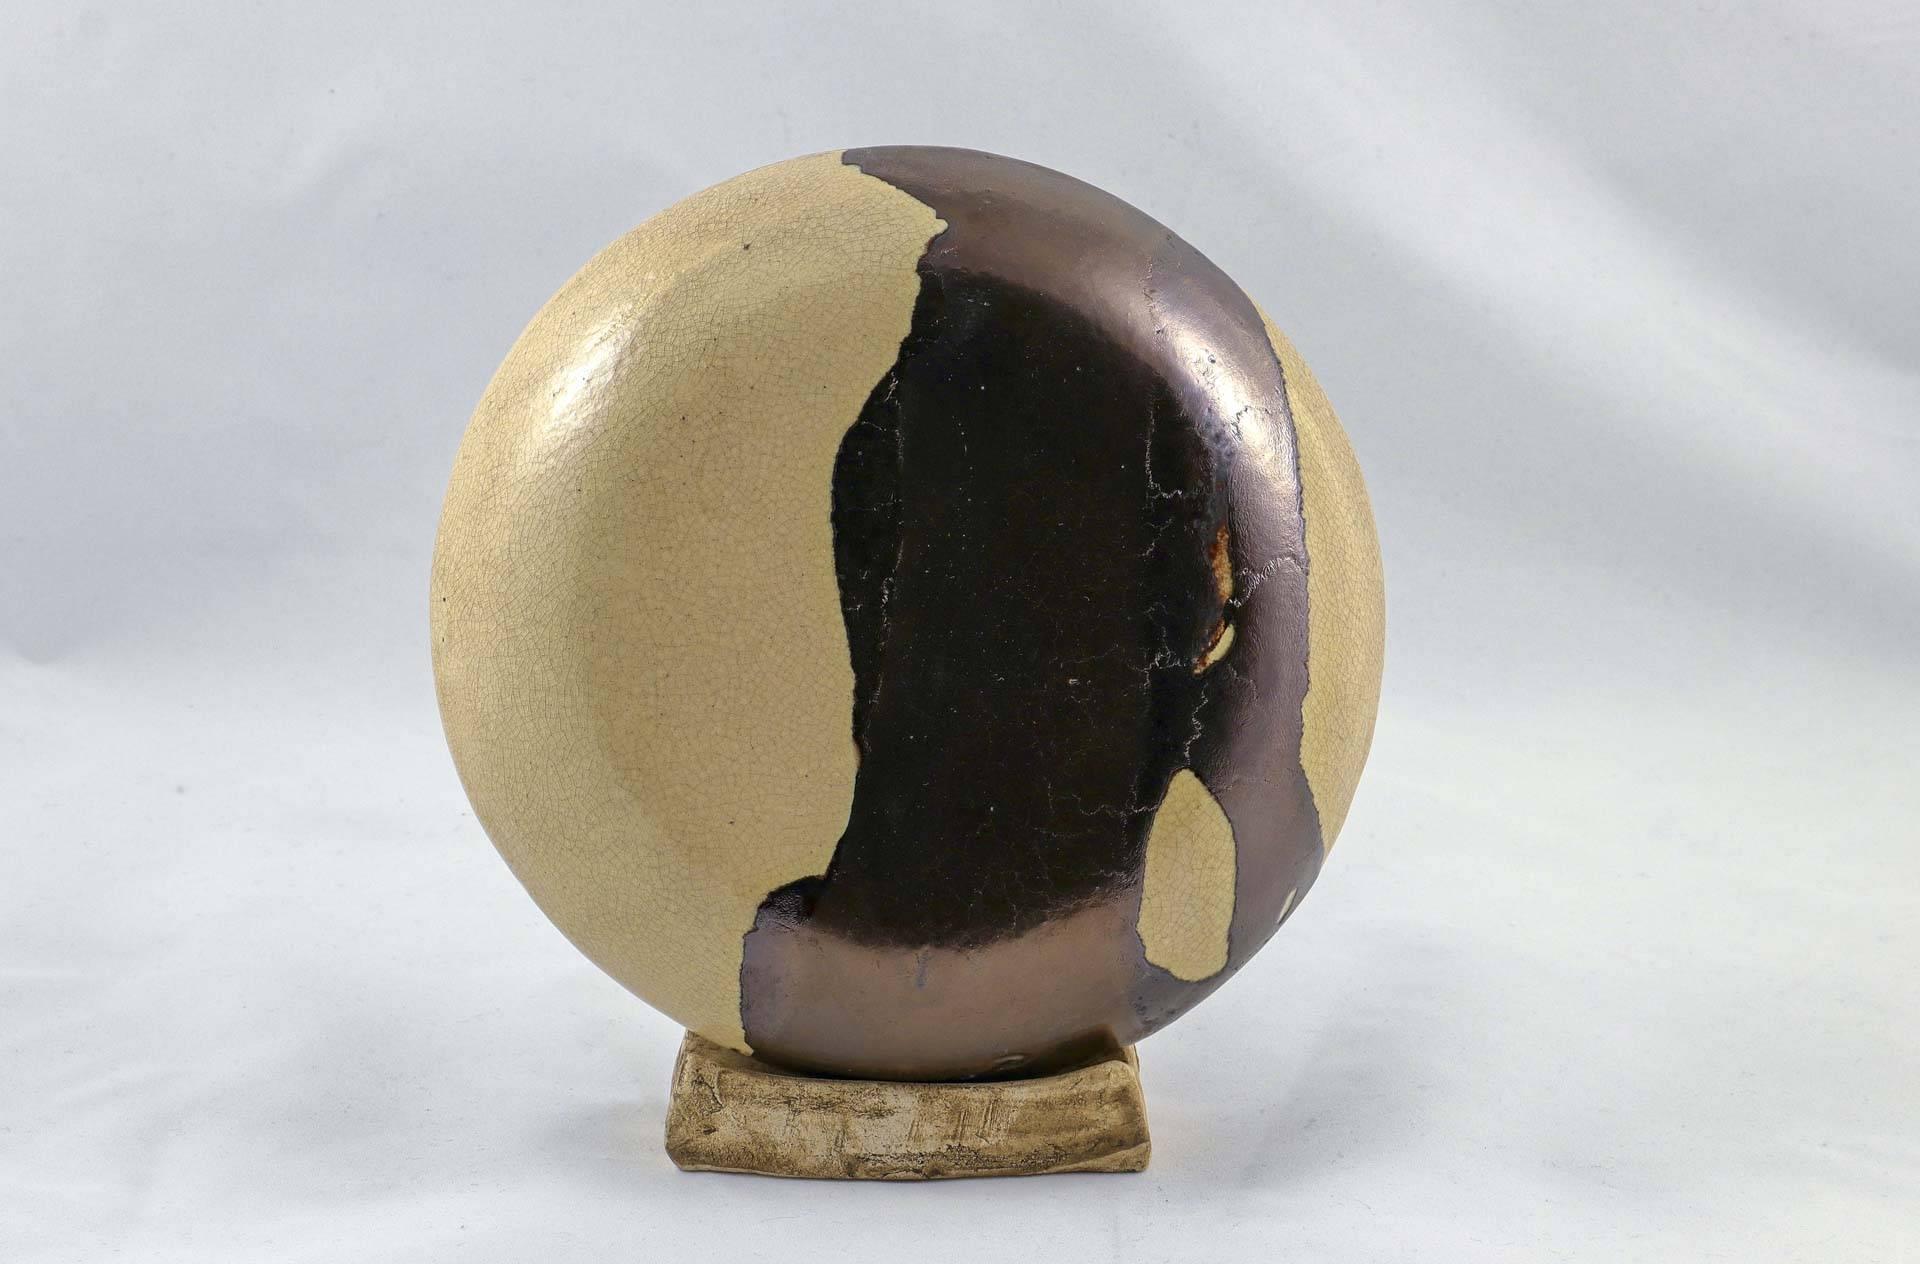 Petra Zobl Keramik - Ufo 1 Seite transpartent craquele bronzit